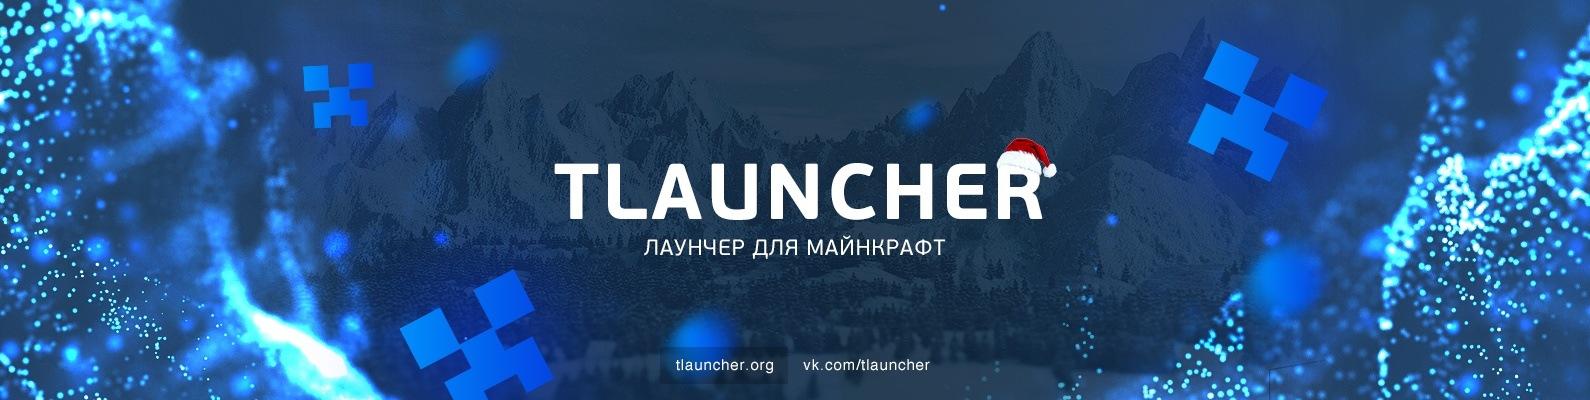 Бонусный код к сайту https tlauncher org